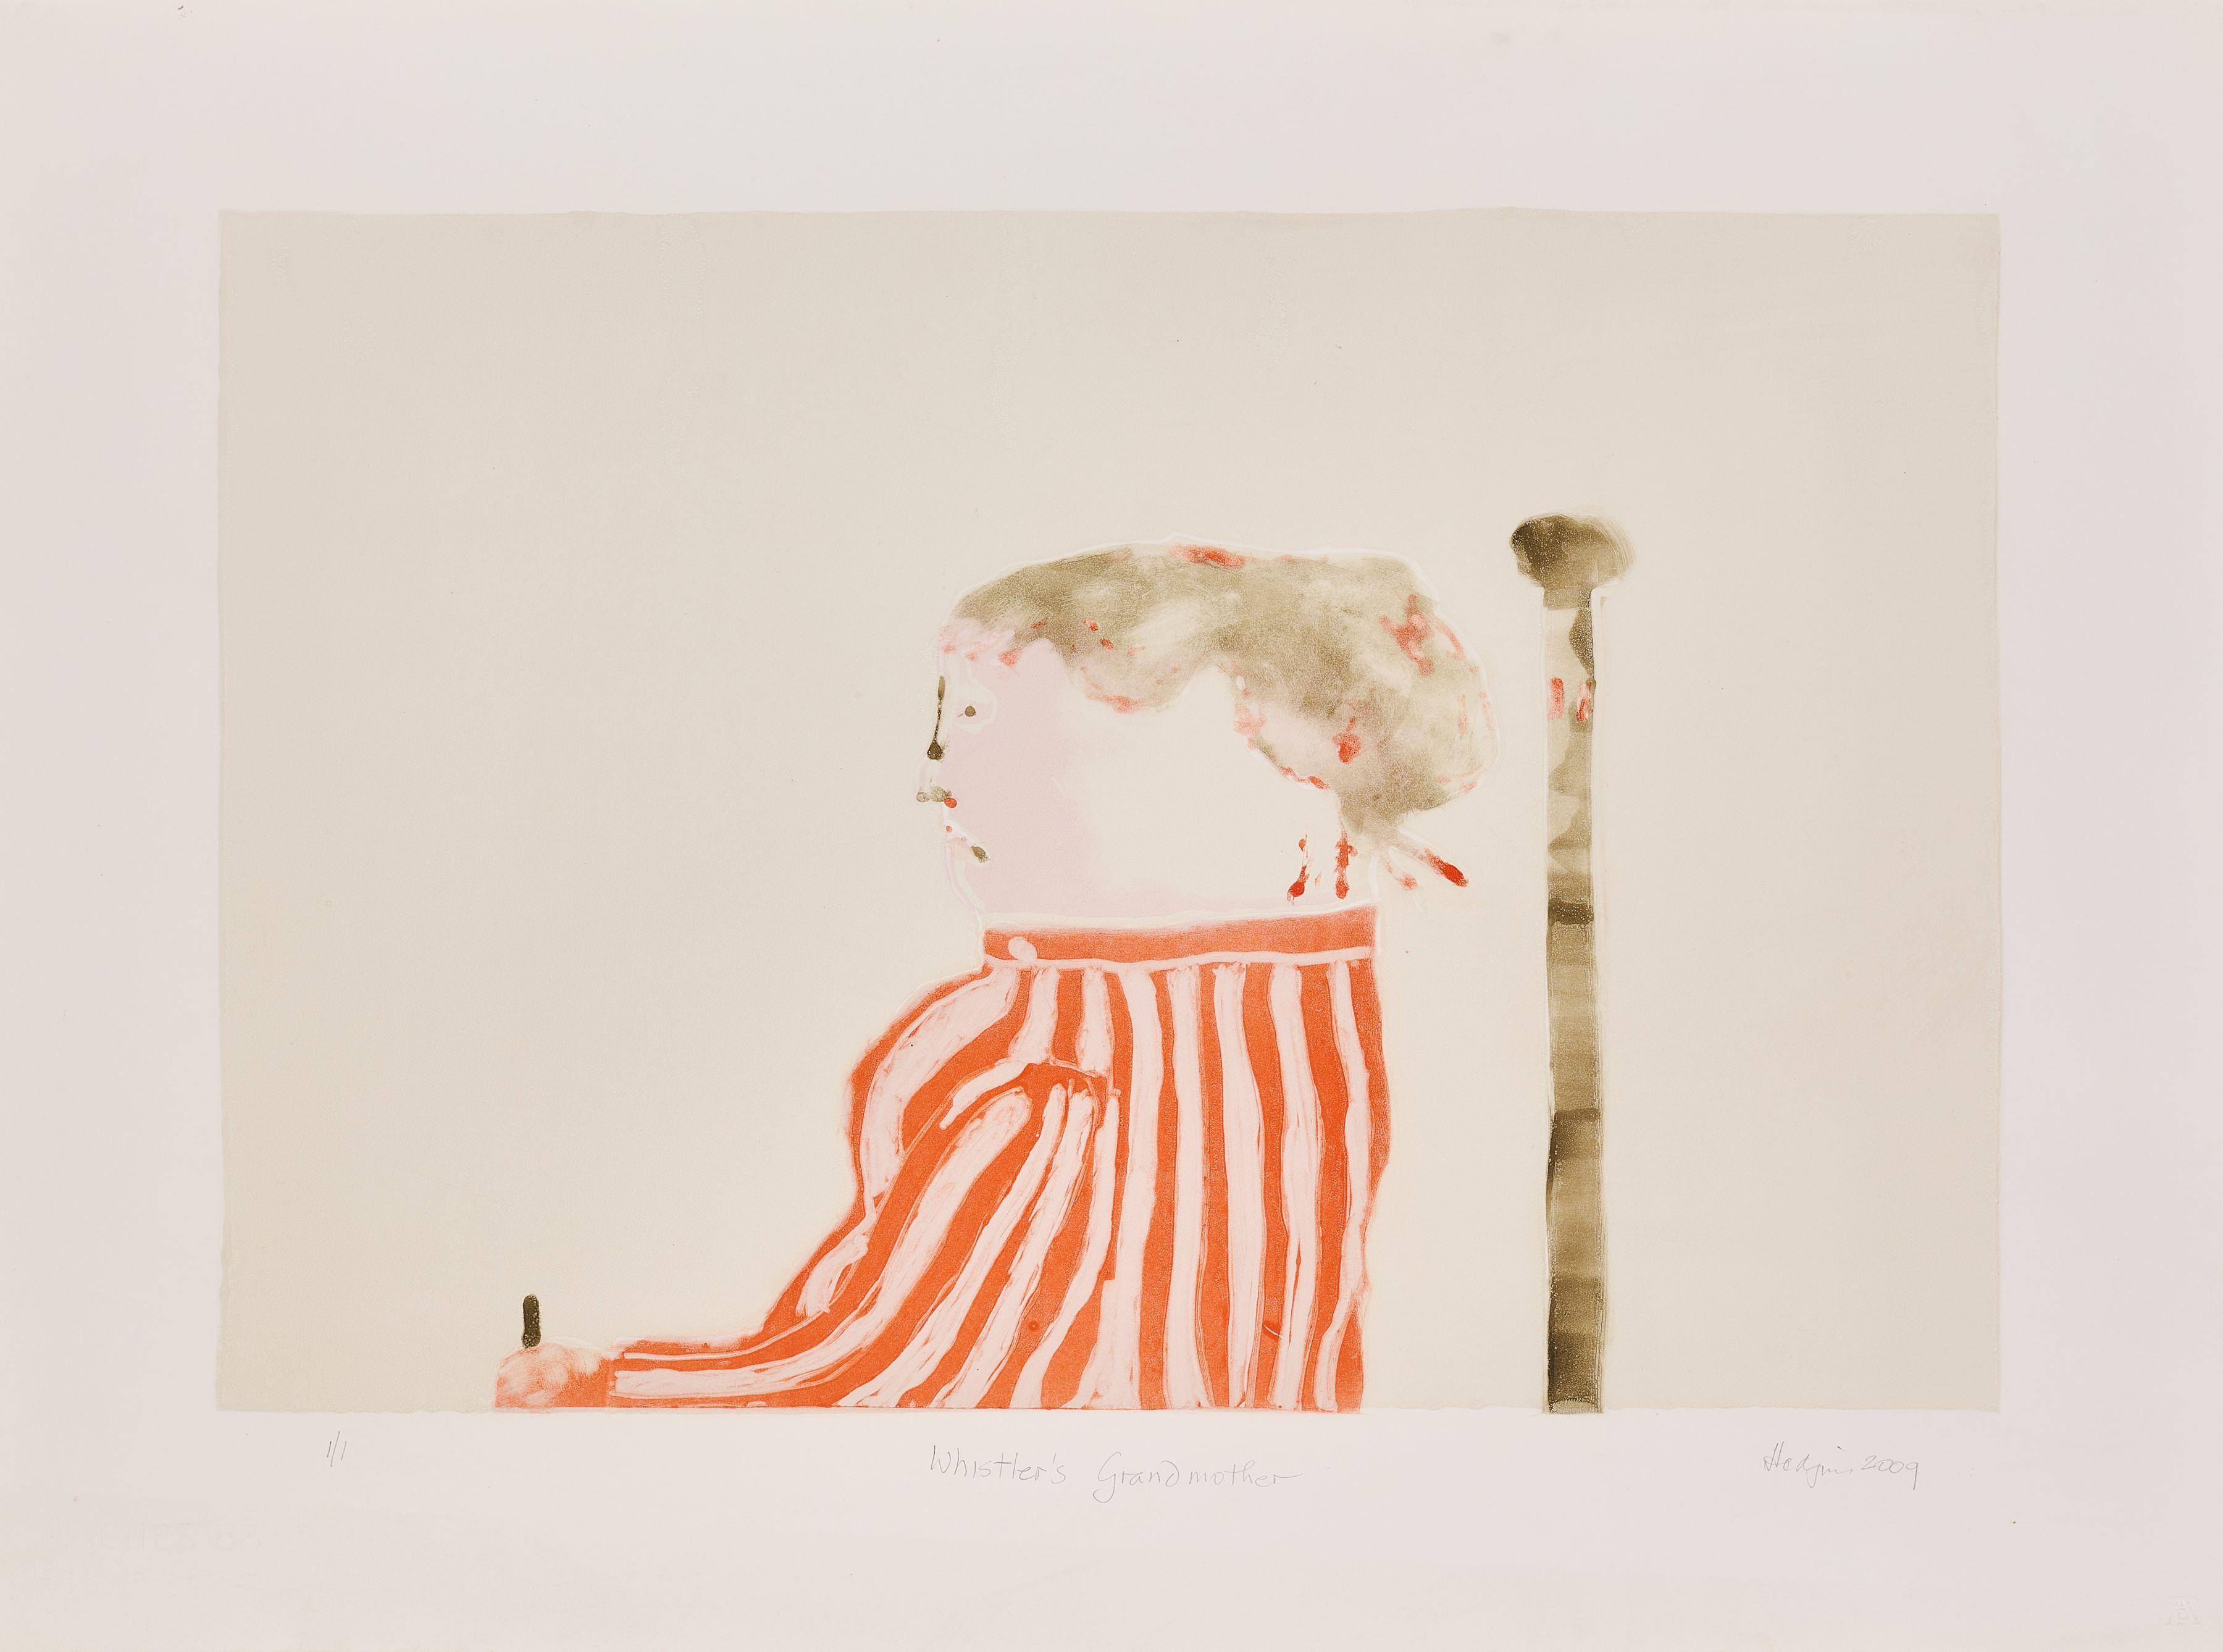 Robert Hodgins - Whistler's Grandmother